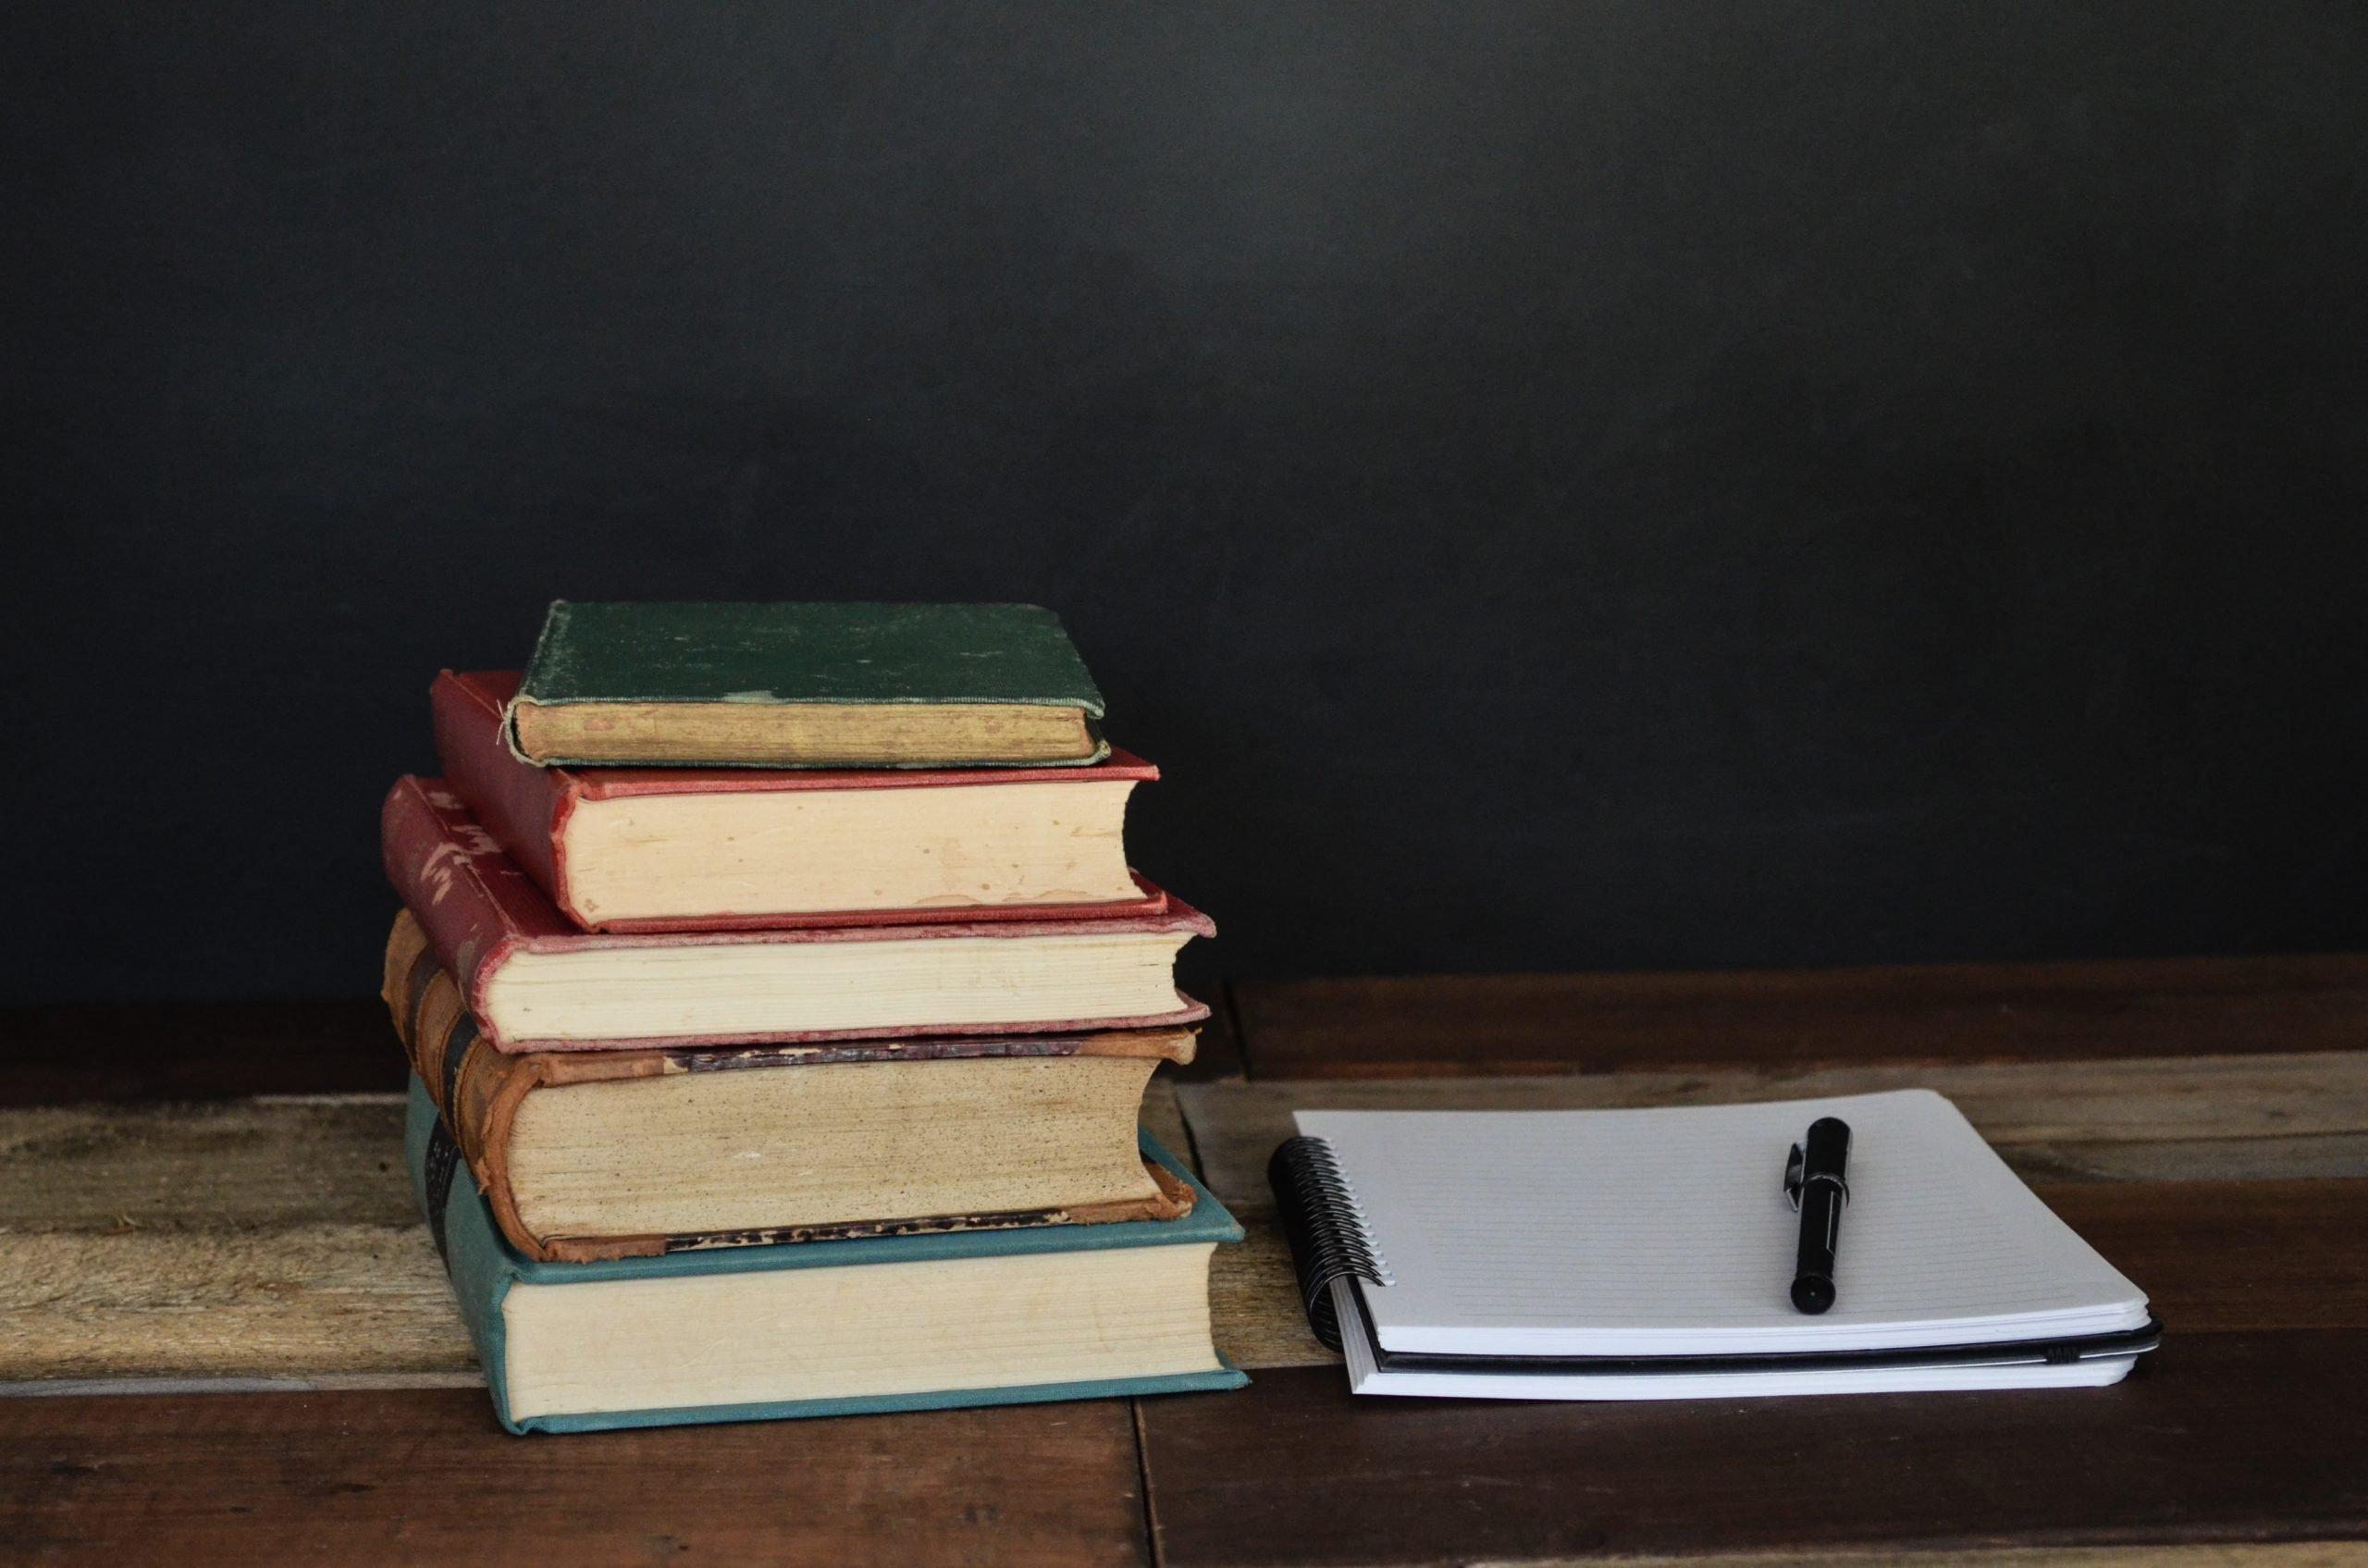 books-on-alcohol-addiction-recoverydebby-hudson-asviIGR3CPE-unsplash